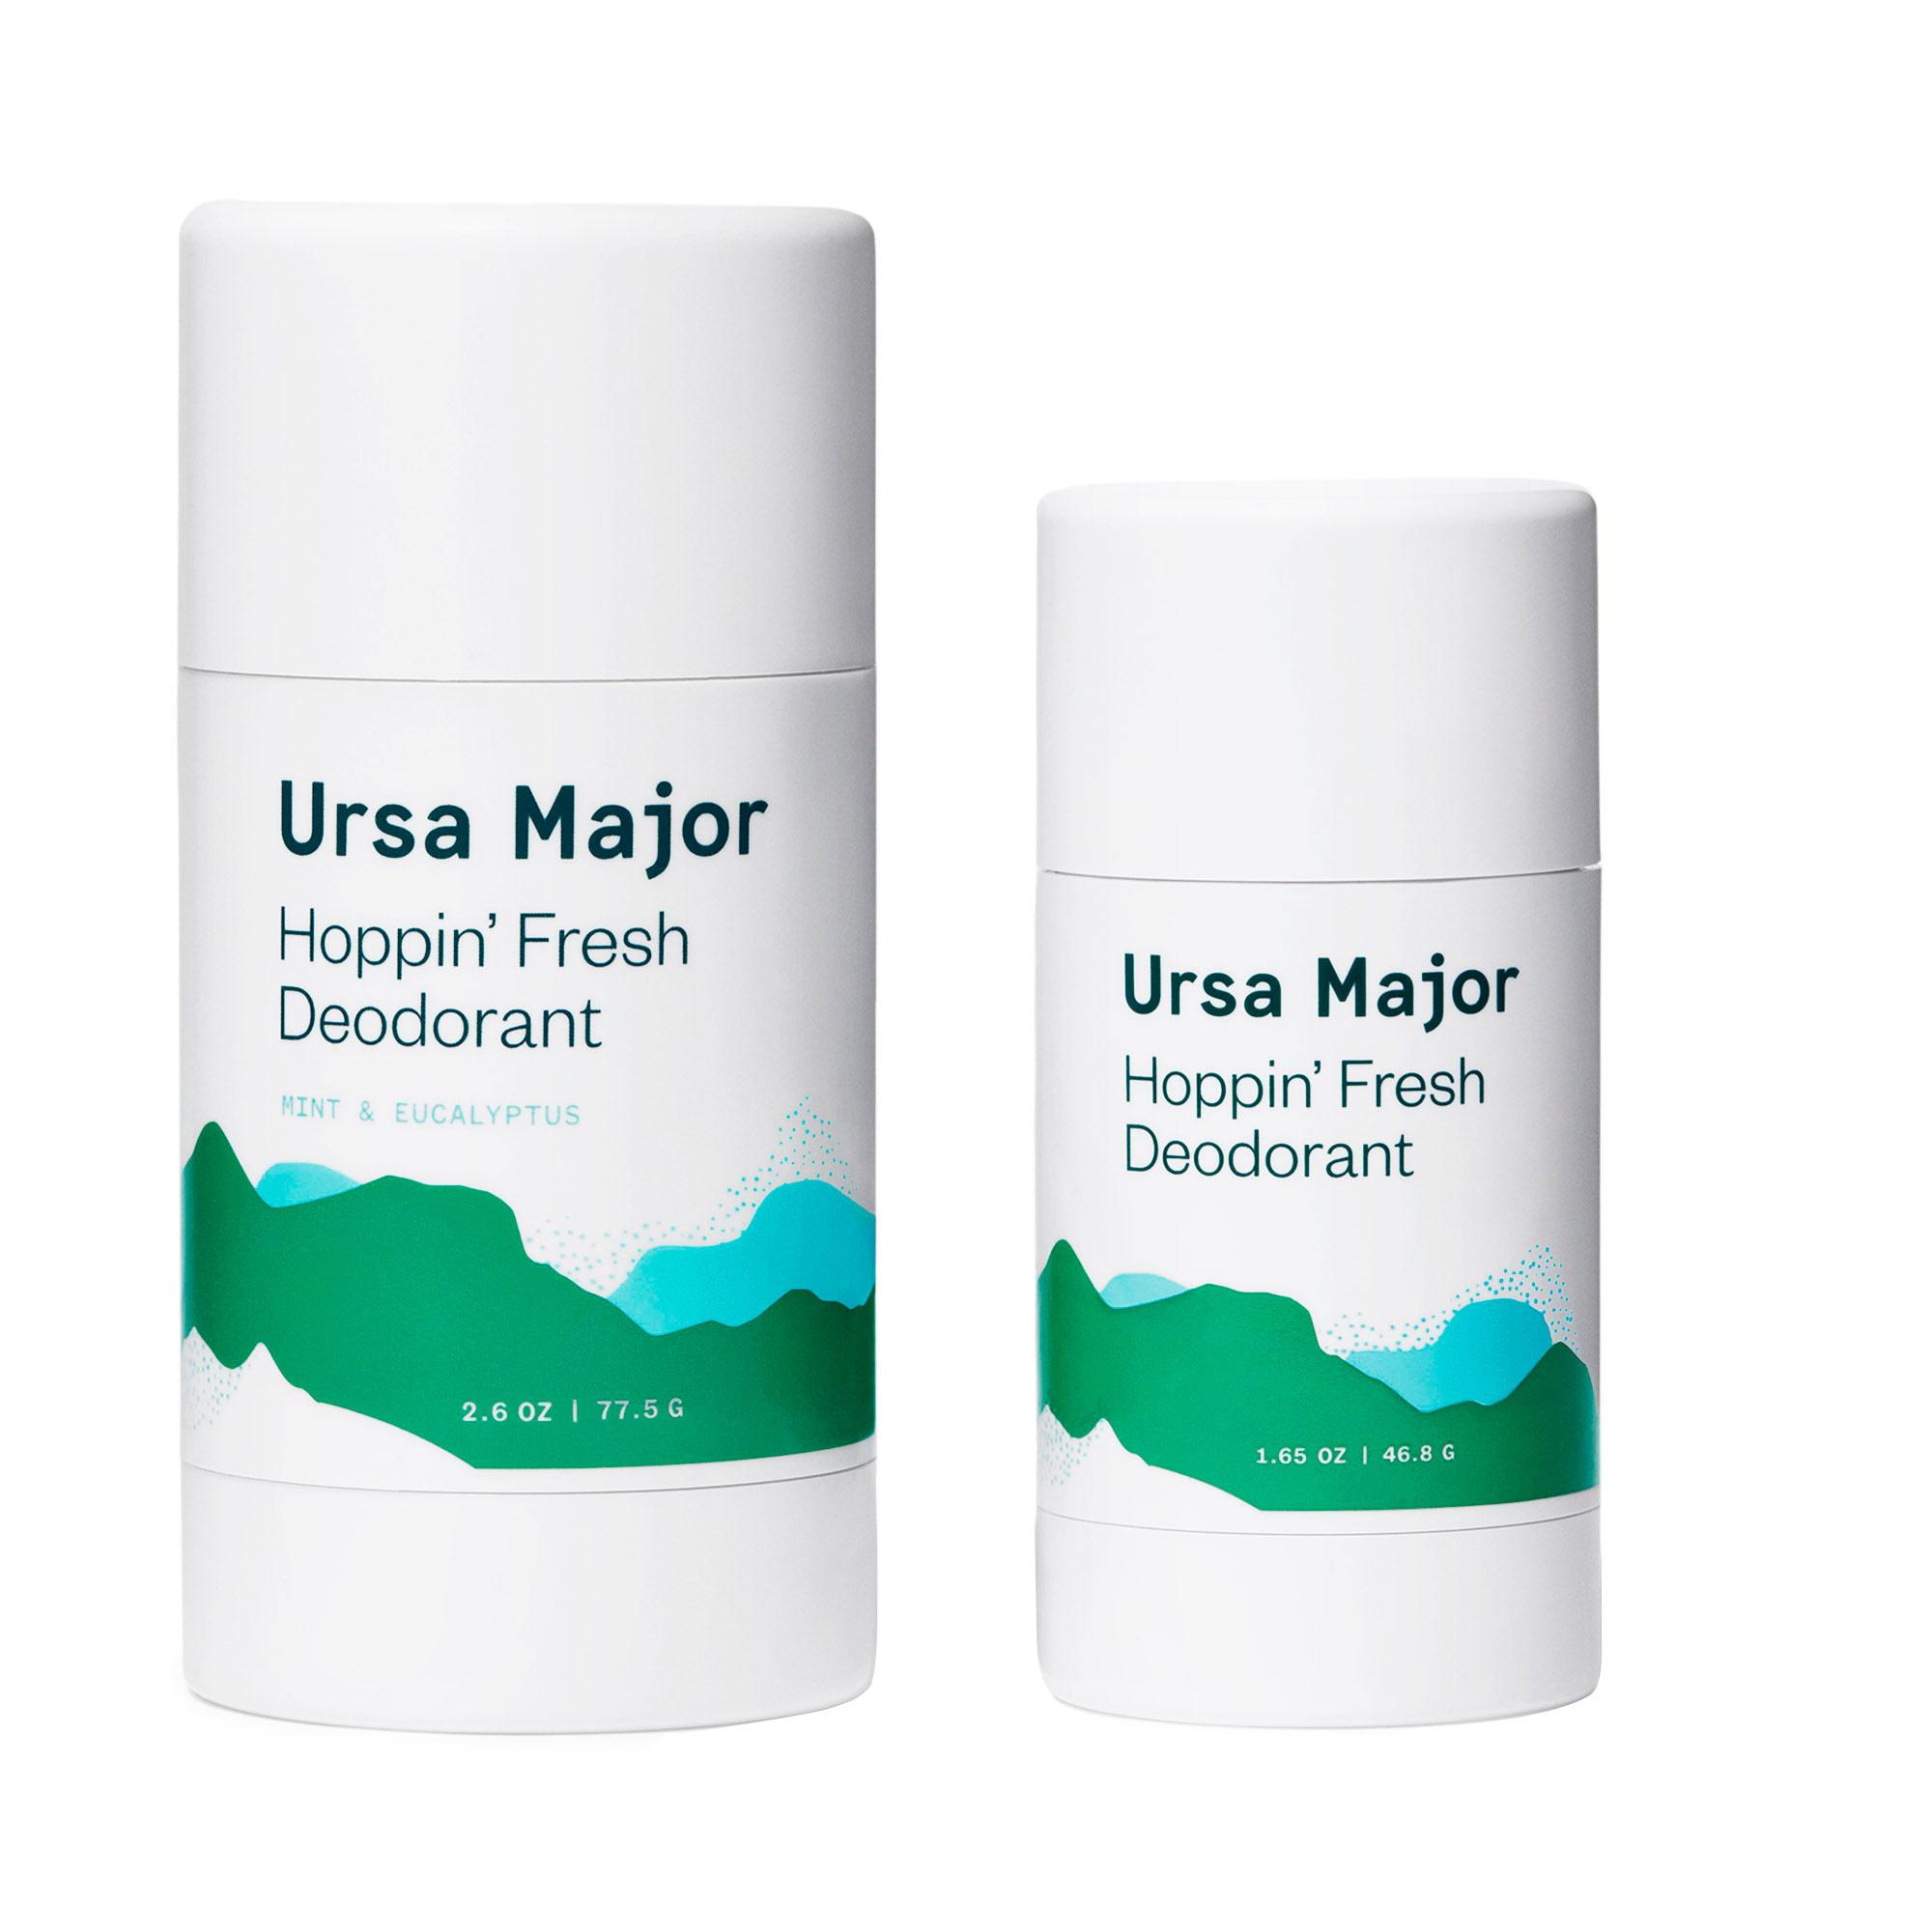 Ursa Major Ursa Major Travel Size Hoppin Fresh Deodorant